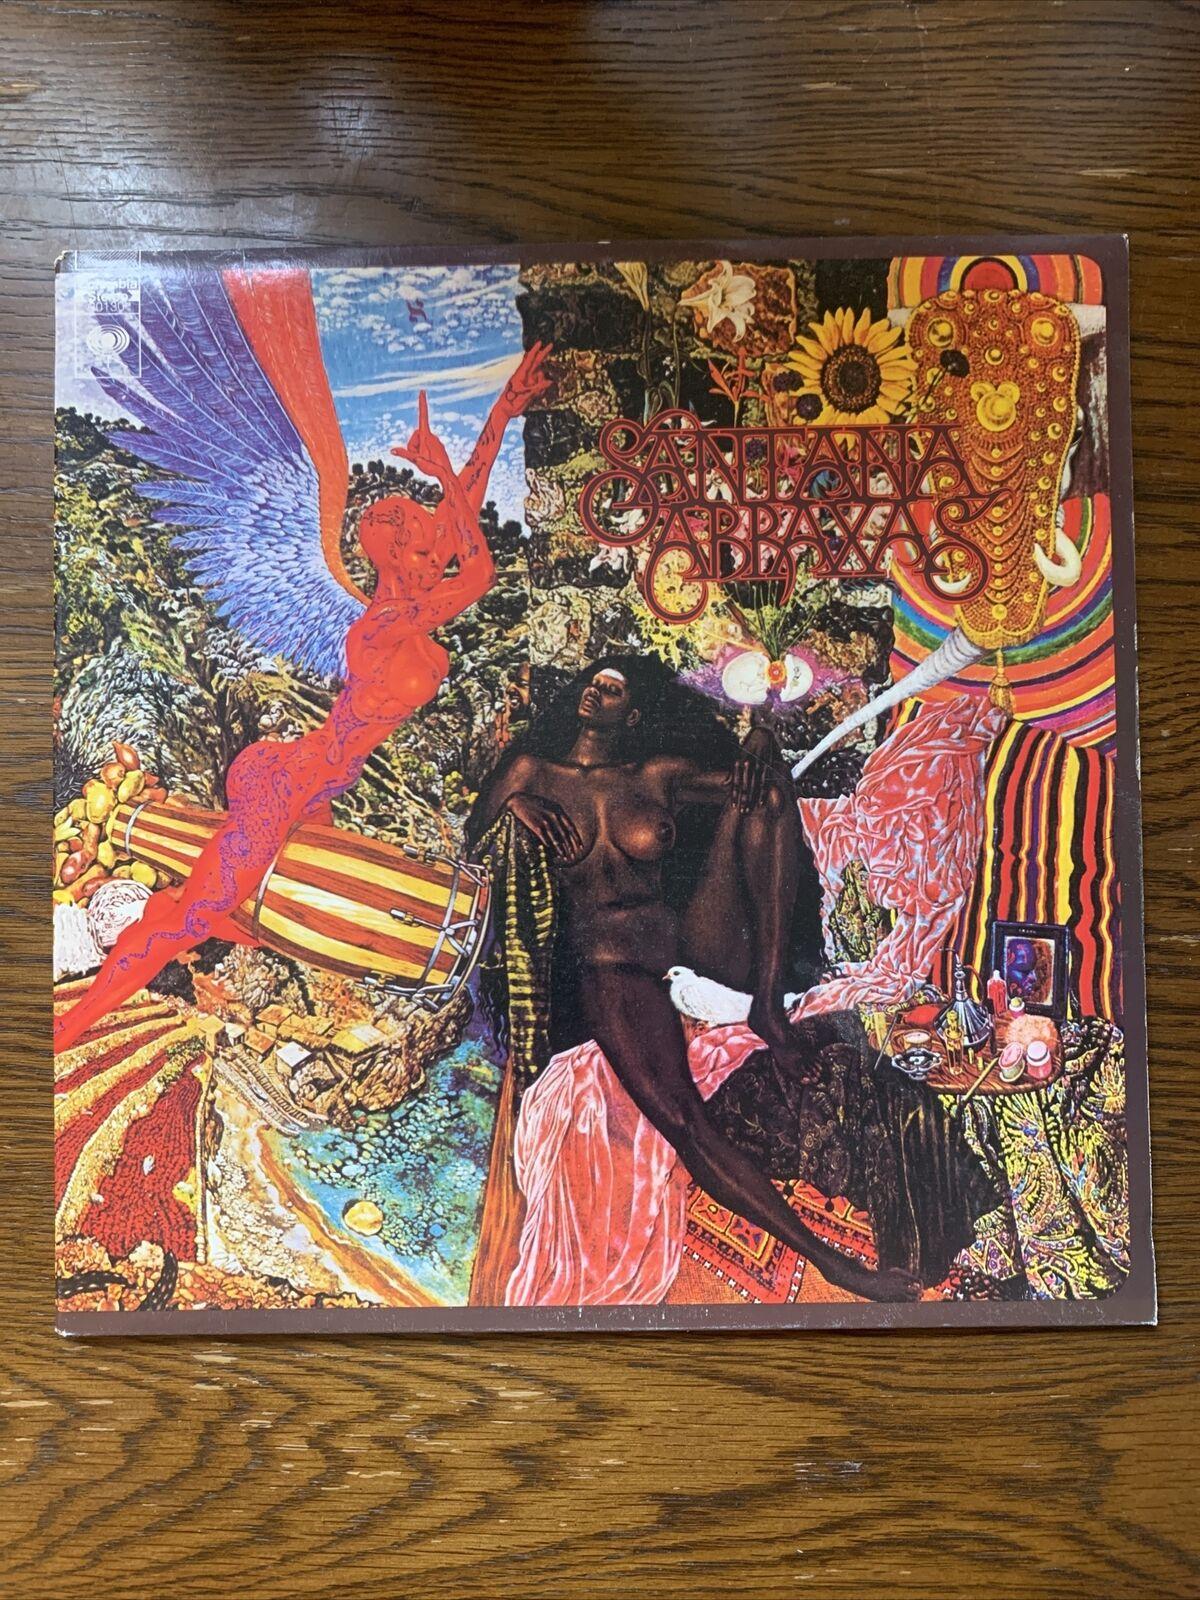 Santana Abraxas Columbia Stereo KC30130 Gatefold Vinyl Record EX-/EX- Nice!